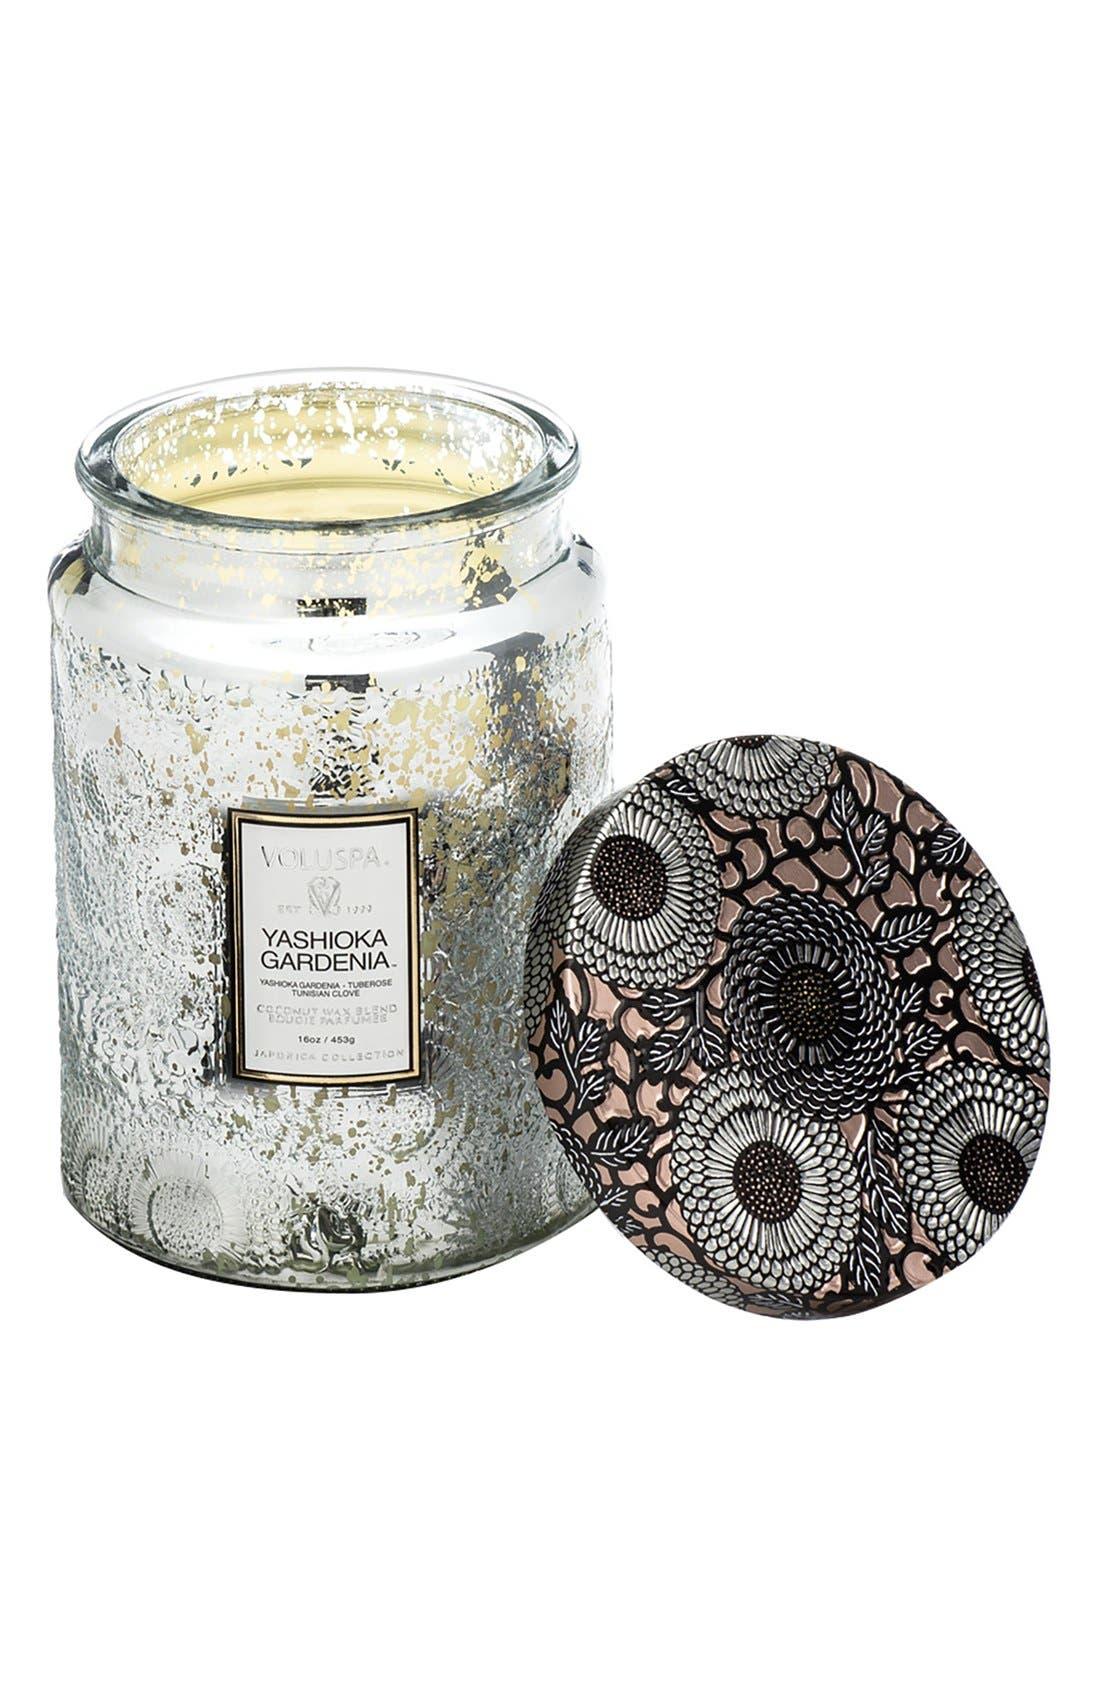 Voluspa 'Japonica - Yashioka Gardenia' Large Embossed Glass Jar Candle (Limited Edition)